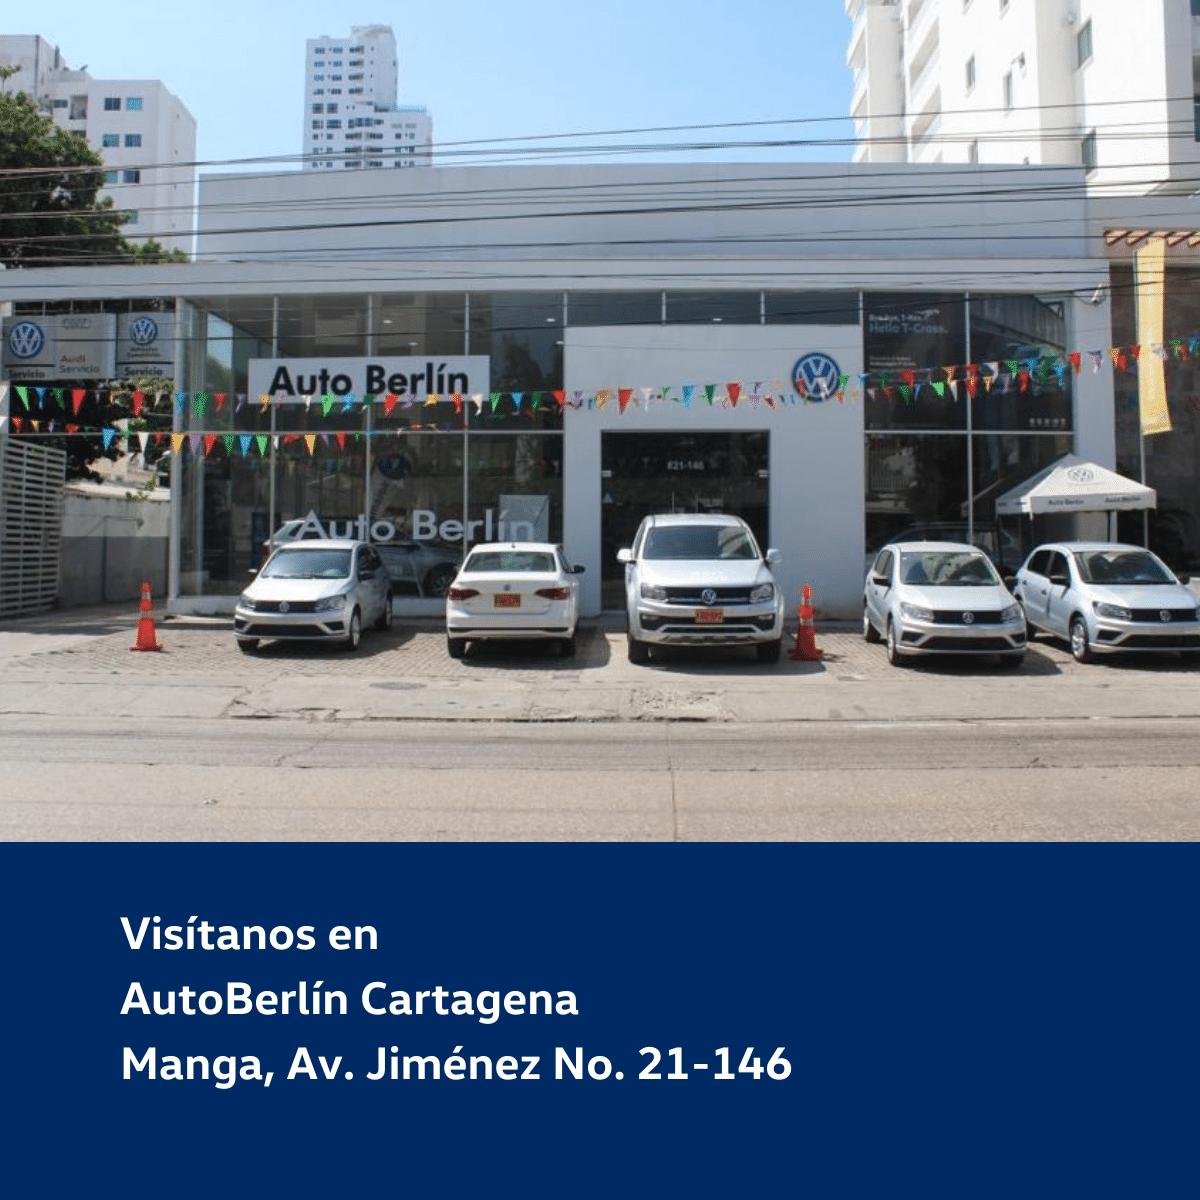 Fachada AB Cartagena.png